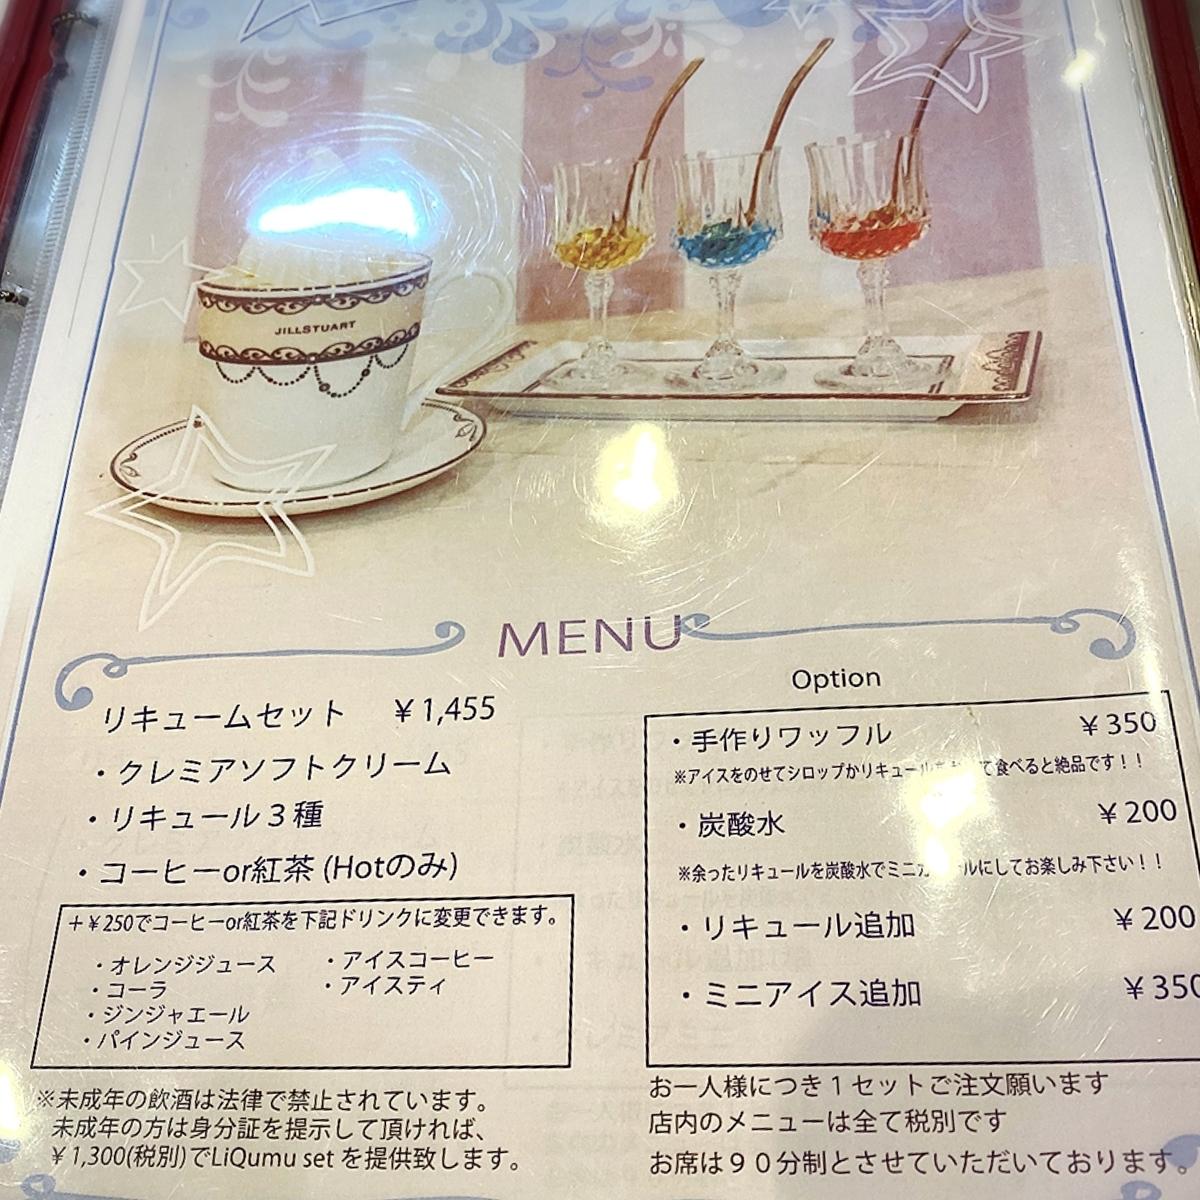 「LiQumu(リキューム)原宿」のメニューと値段